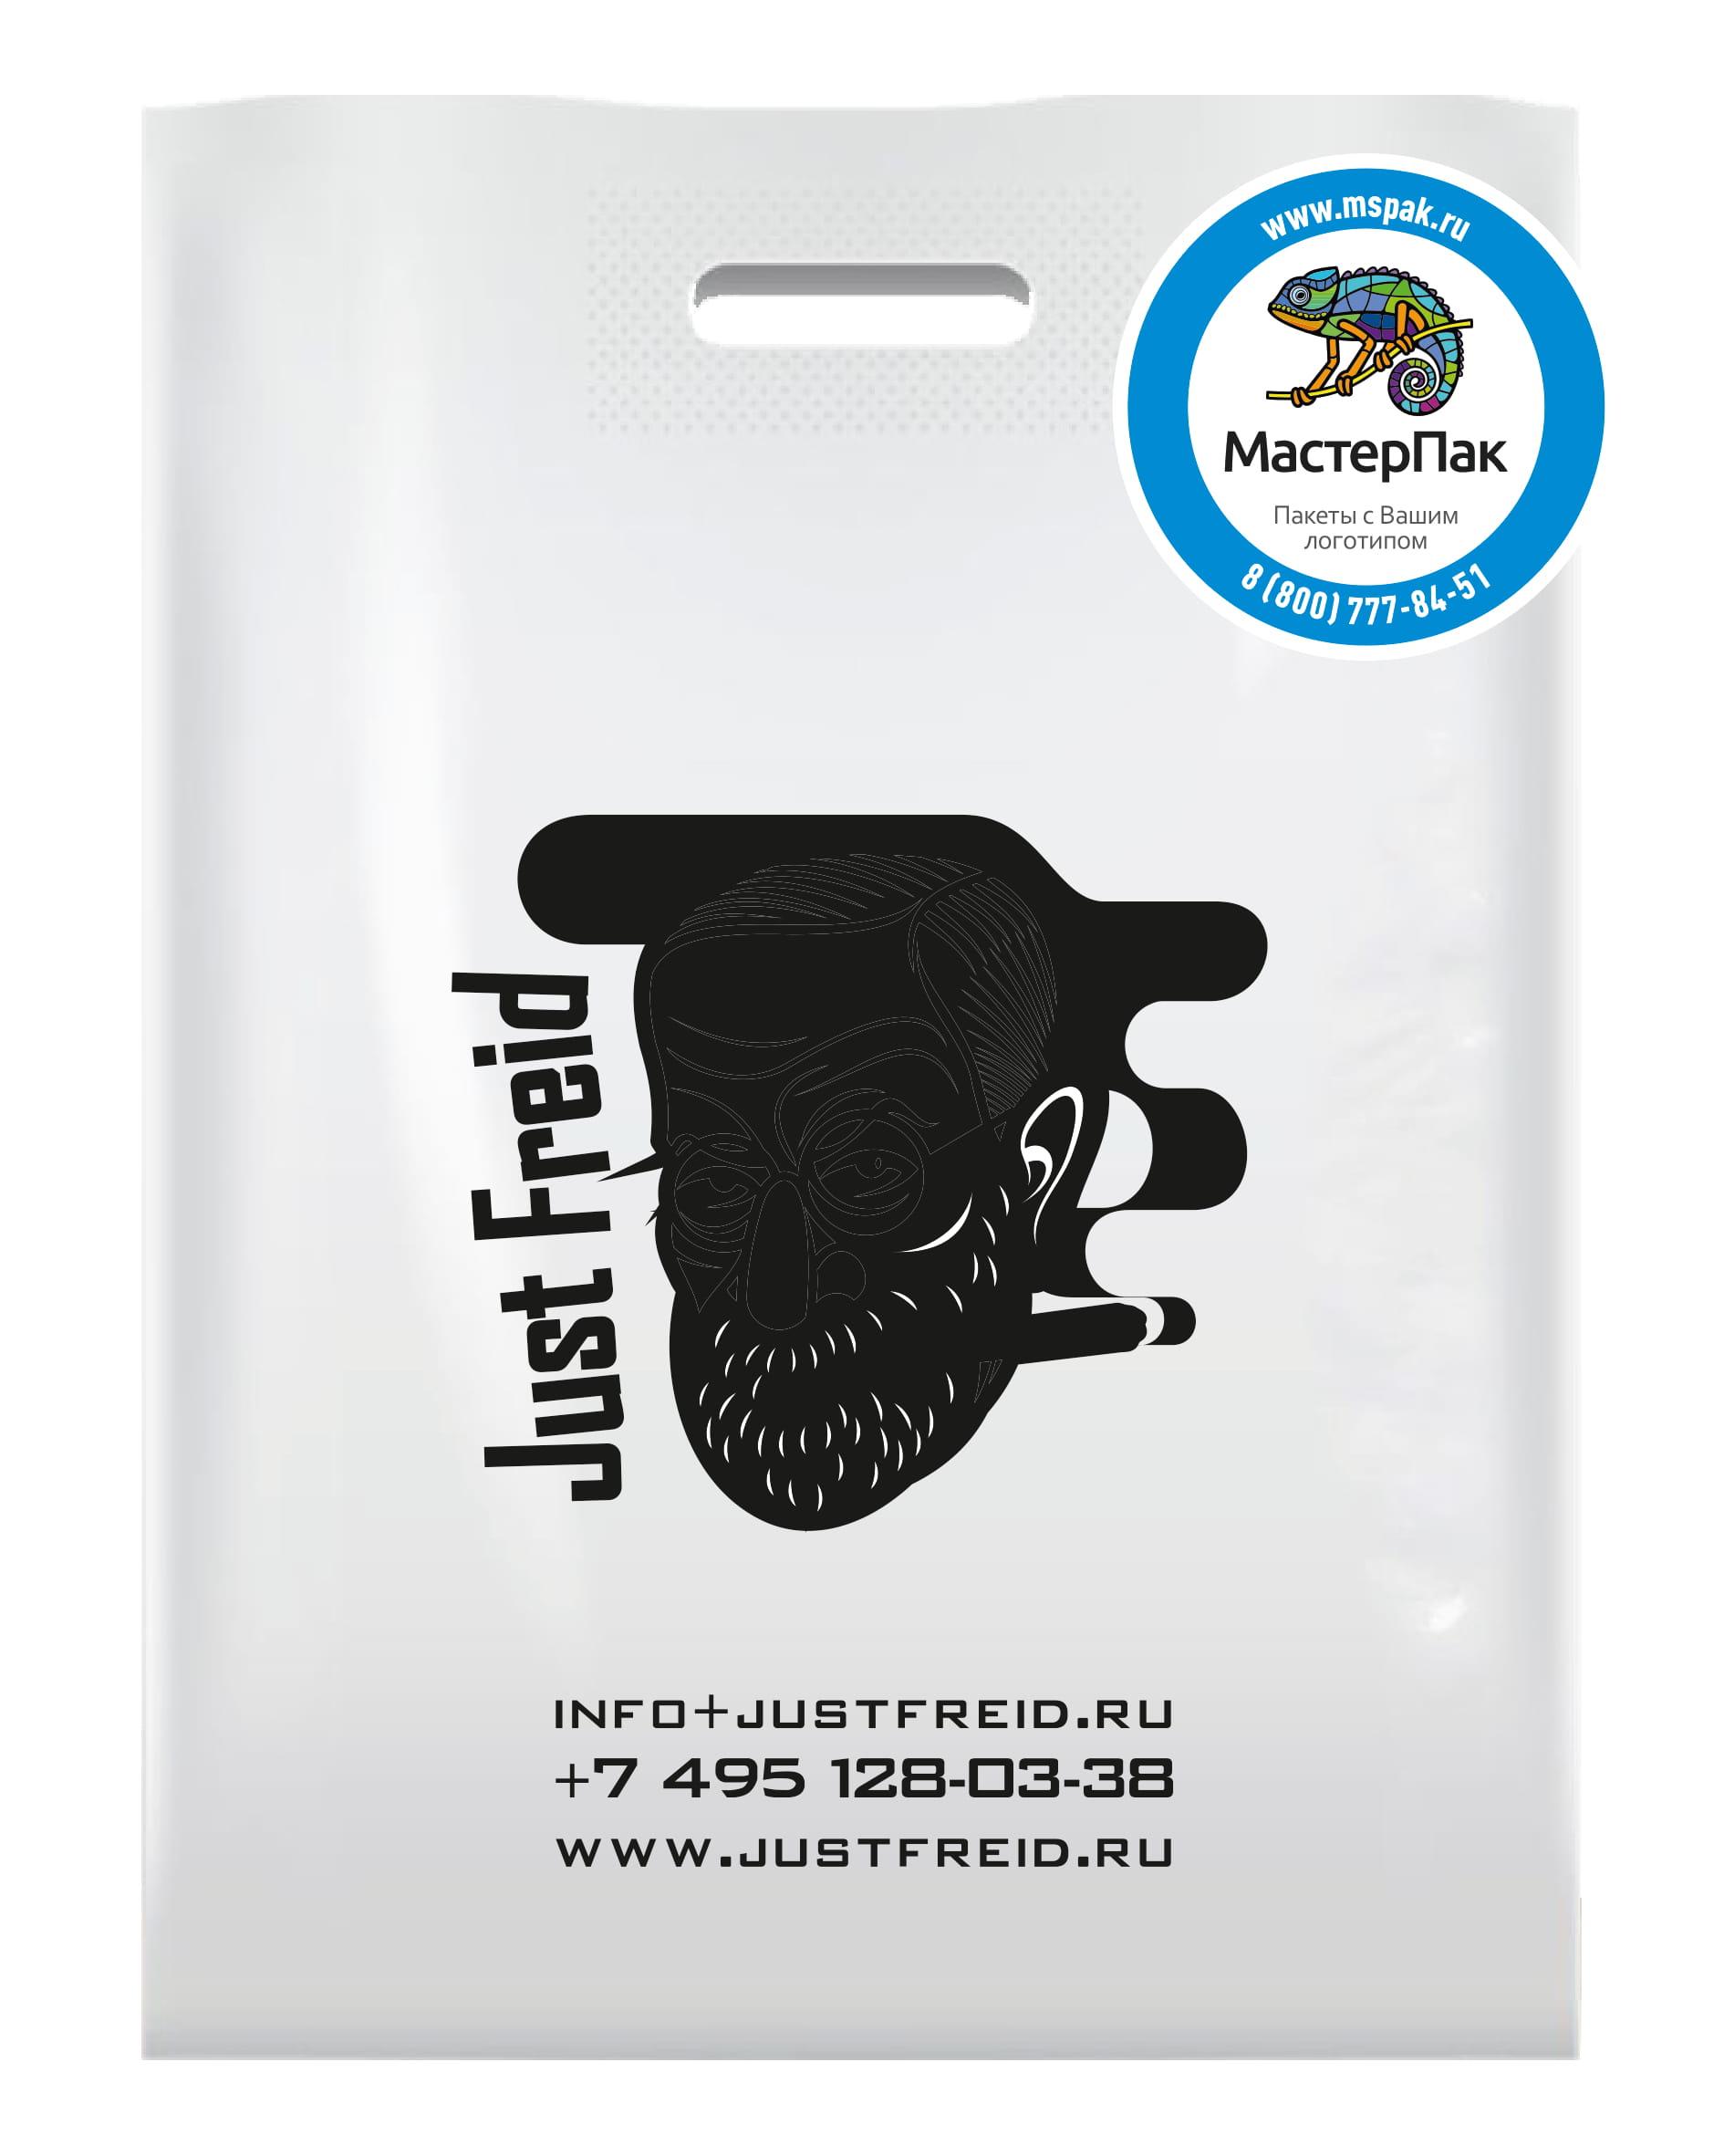 ПВД пакет с логотипом магазина Just Freid, Москва, 70 мкм, белый